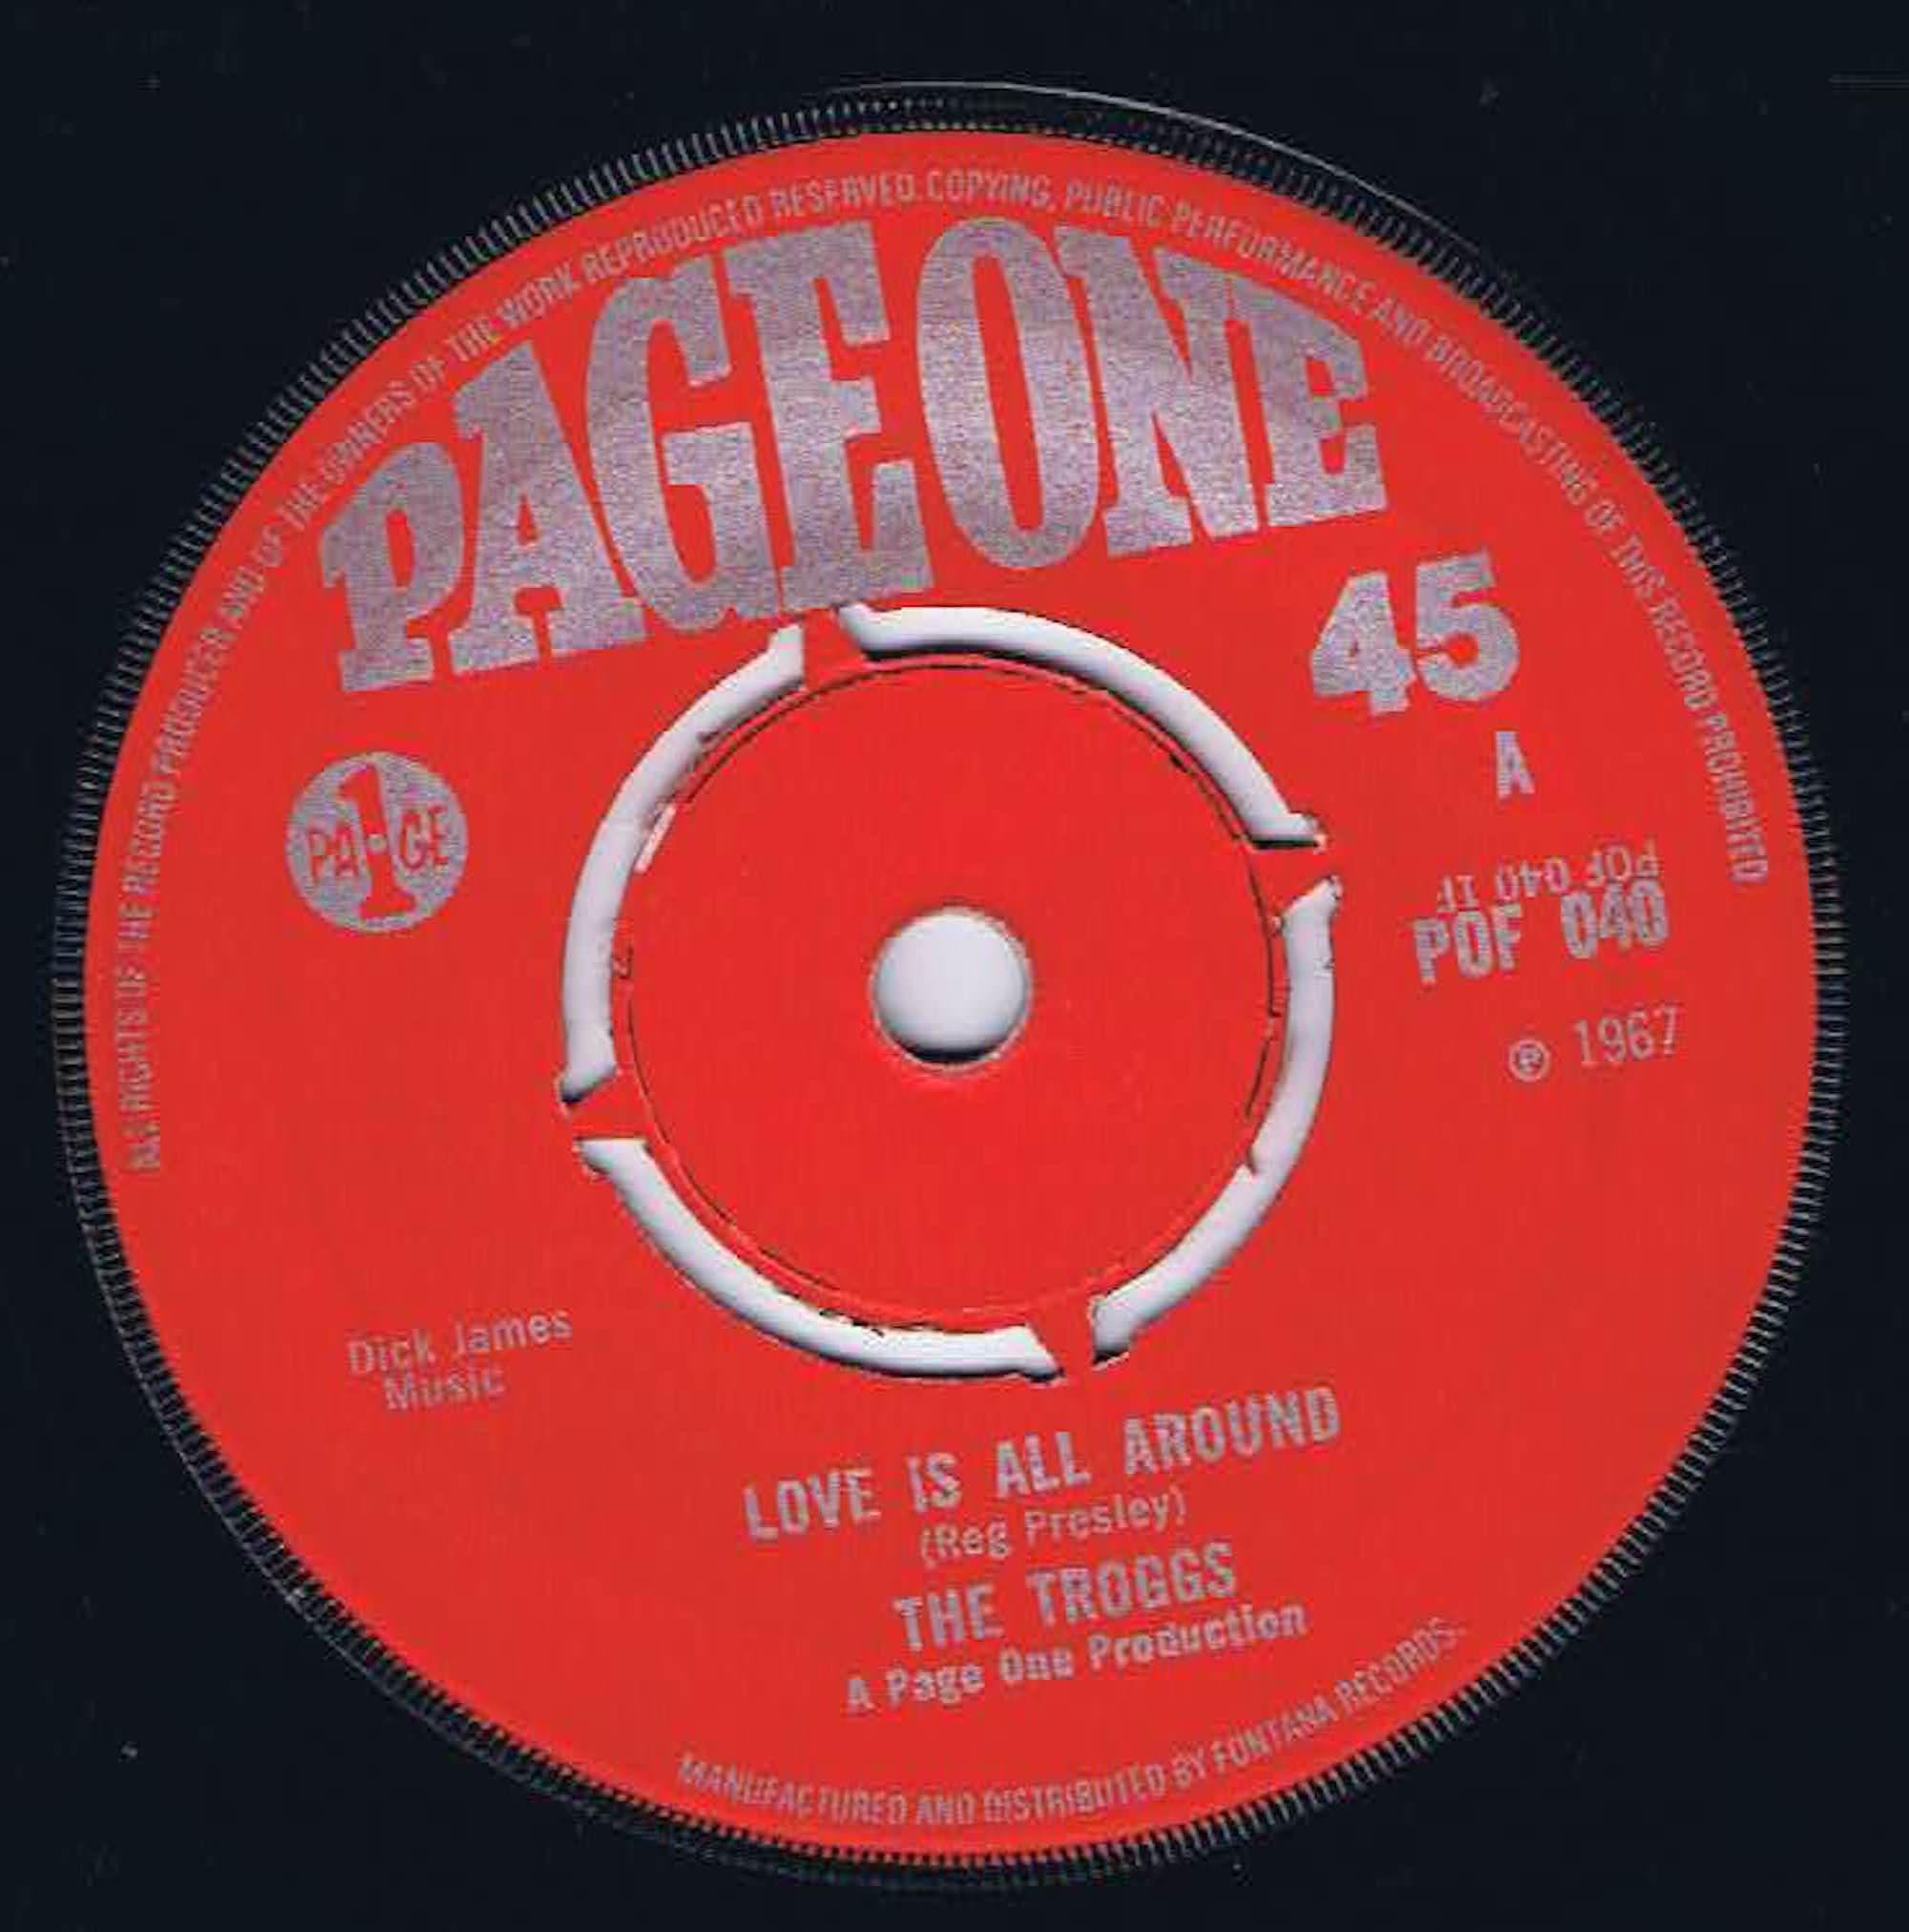 The Troggs – Love Is All Around - POF 040 - 7-inch Vinyl Record